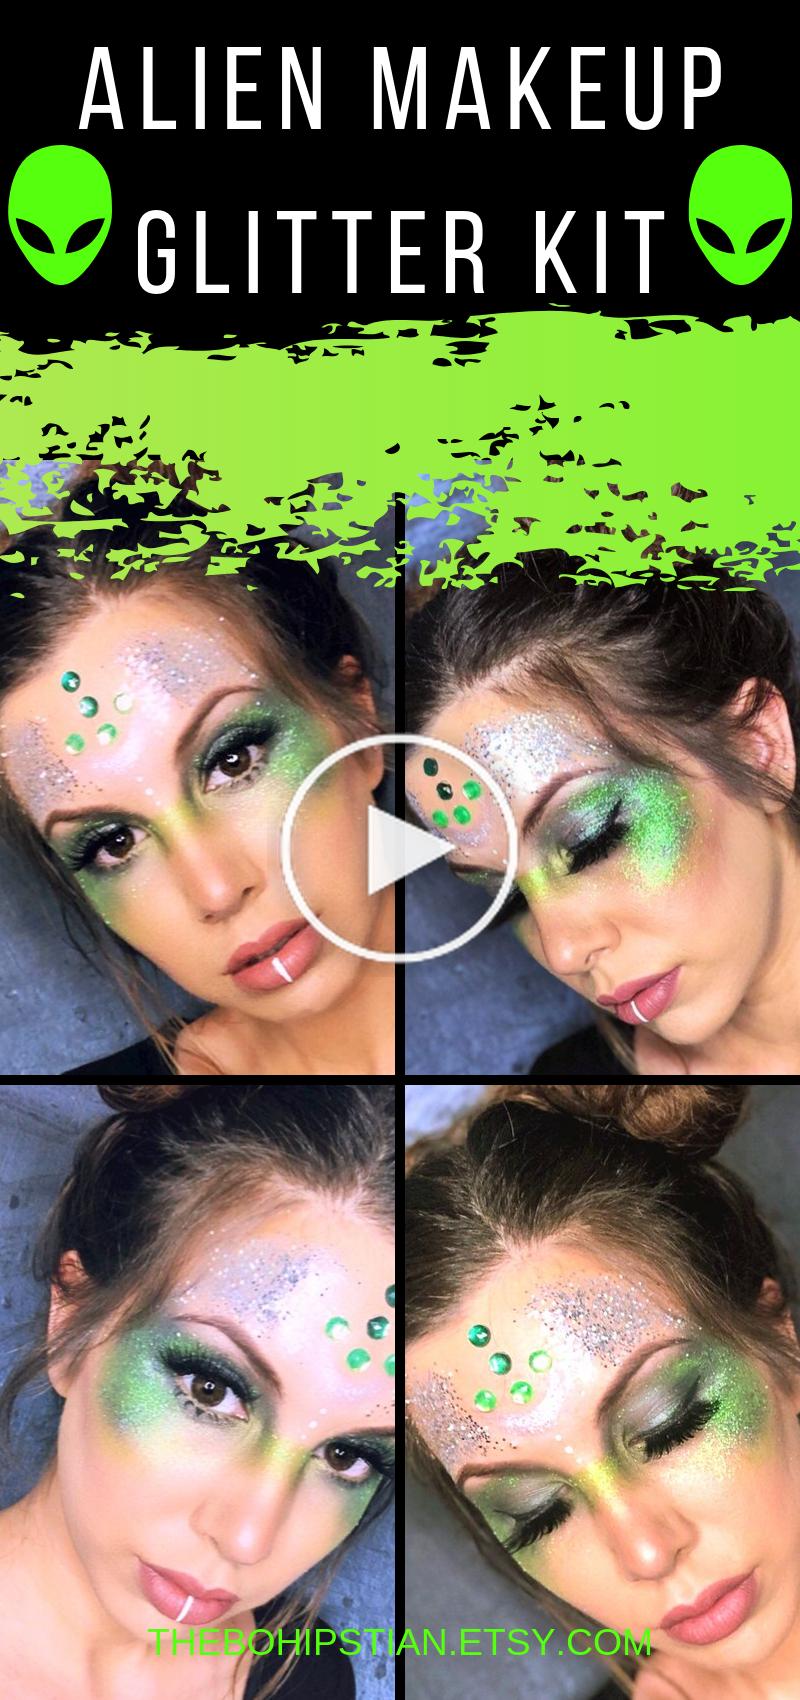 Alien Costume Women Glitter Makeup Alien Makeup Cosmetic Glitter Set Loose Glitter Area 51 Face